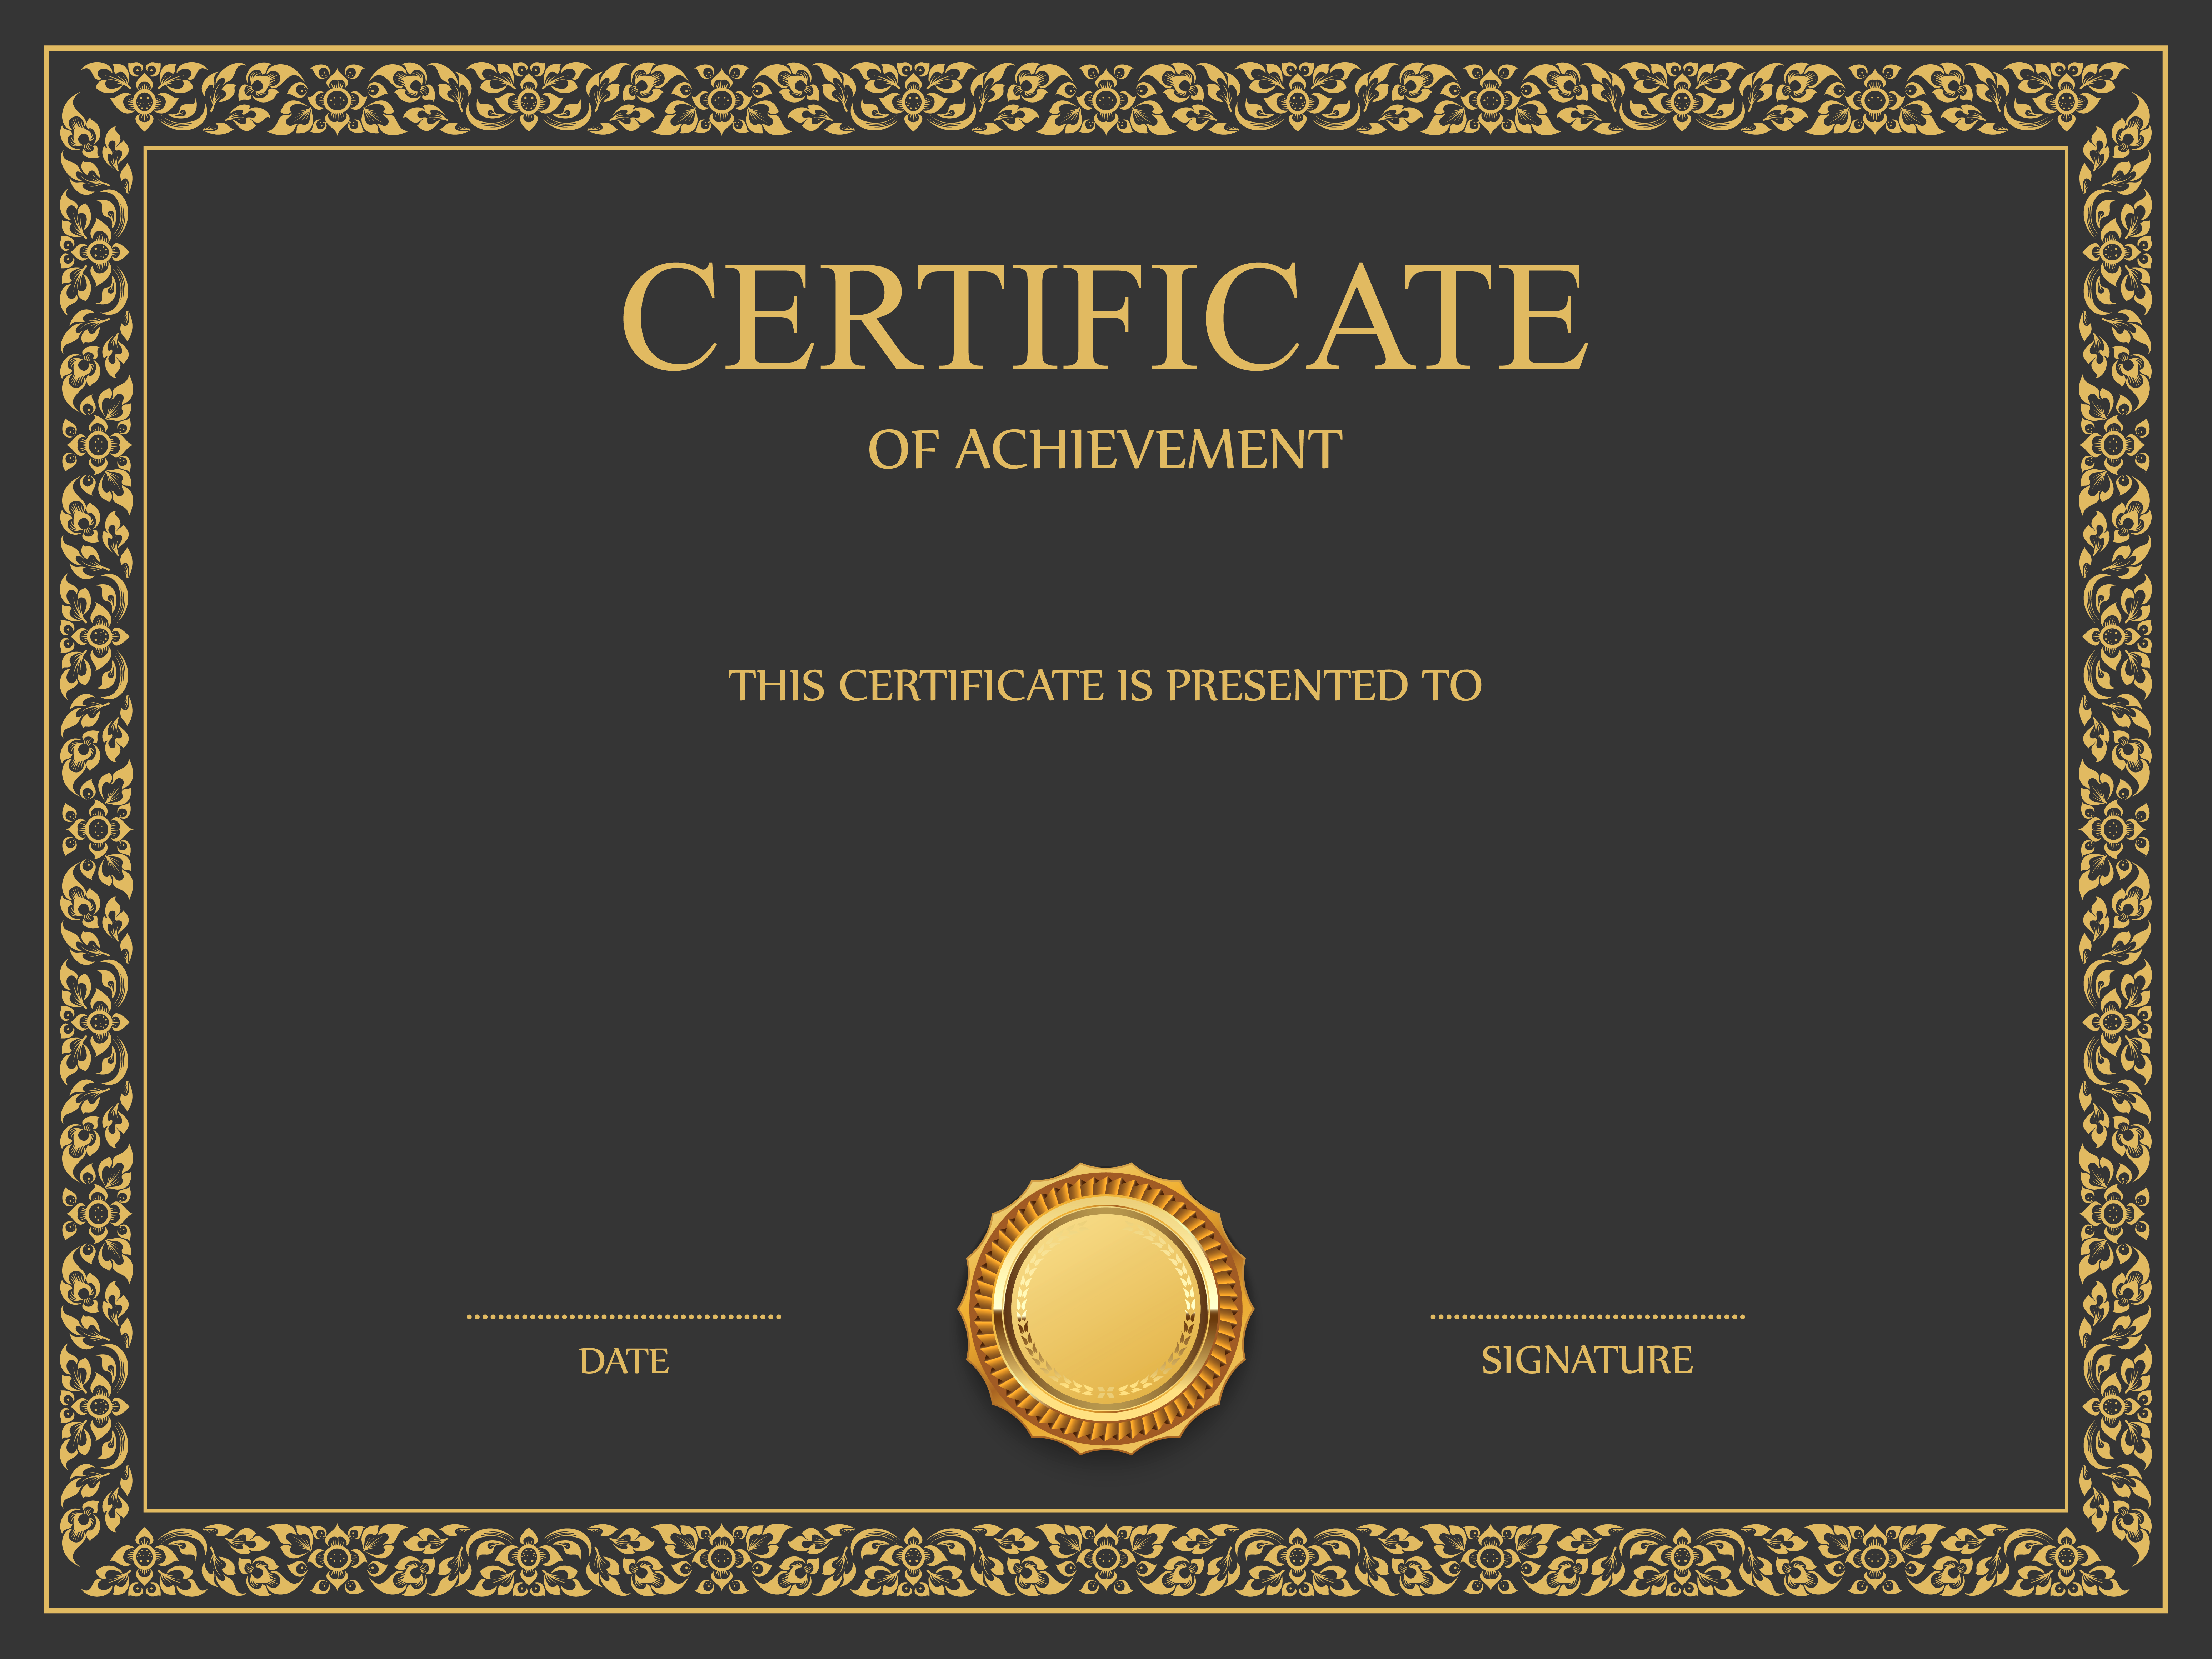 Certificate Template Png Image Certificate Templates Certificate Design Template Certificate Design